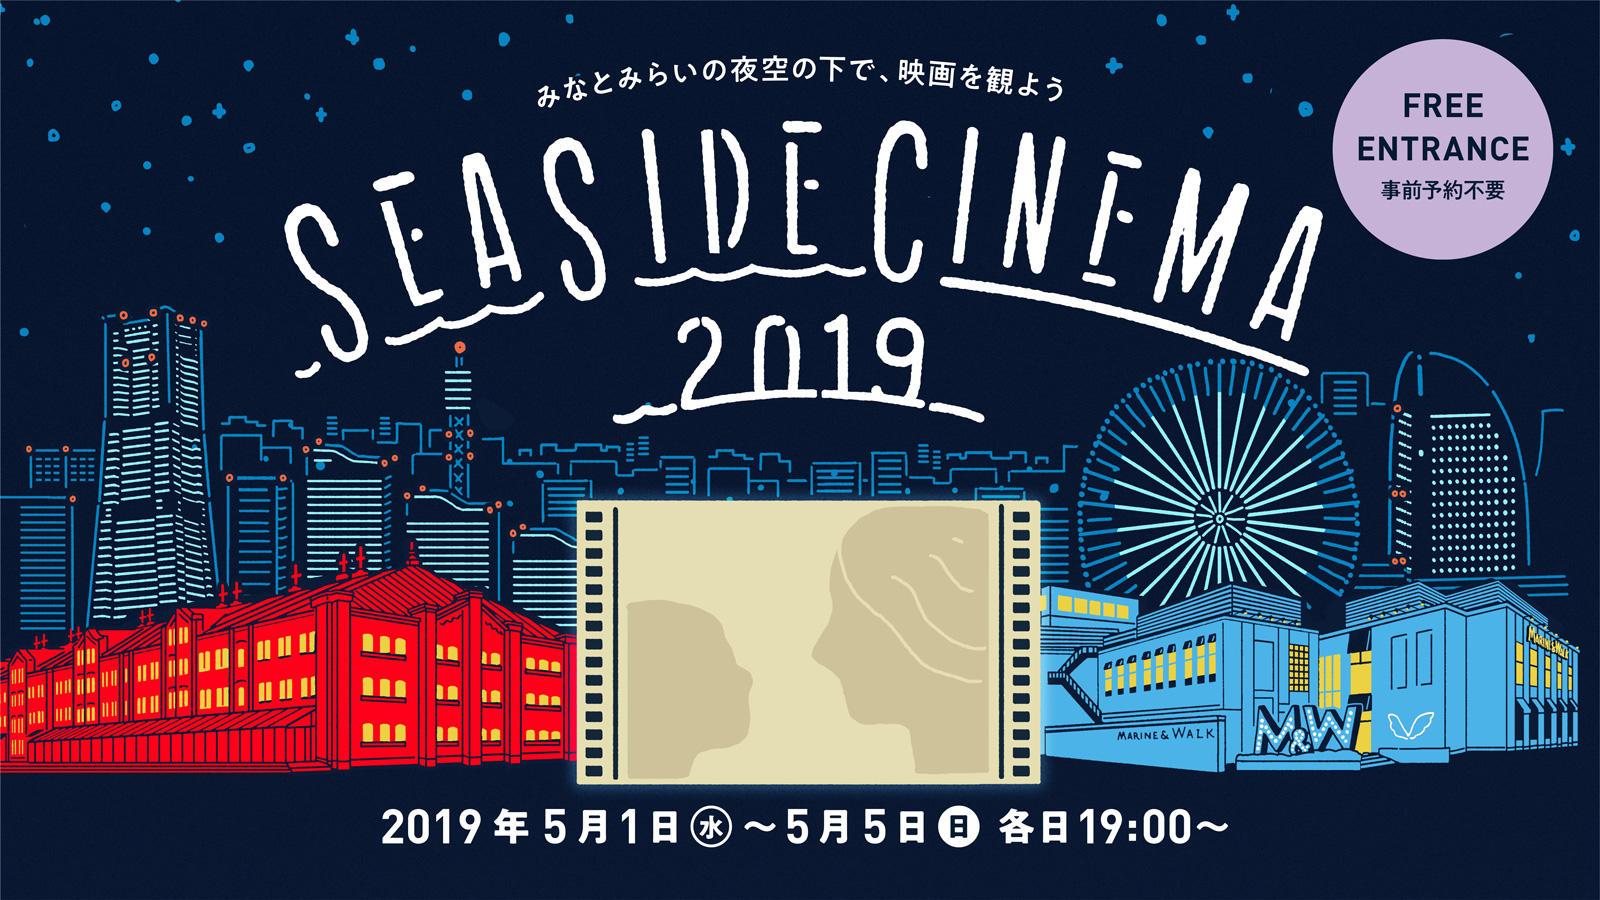 2019.5.1wed - 5.5sun  SEACIDE CINEMA2019